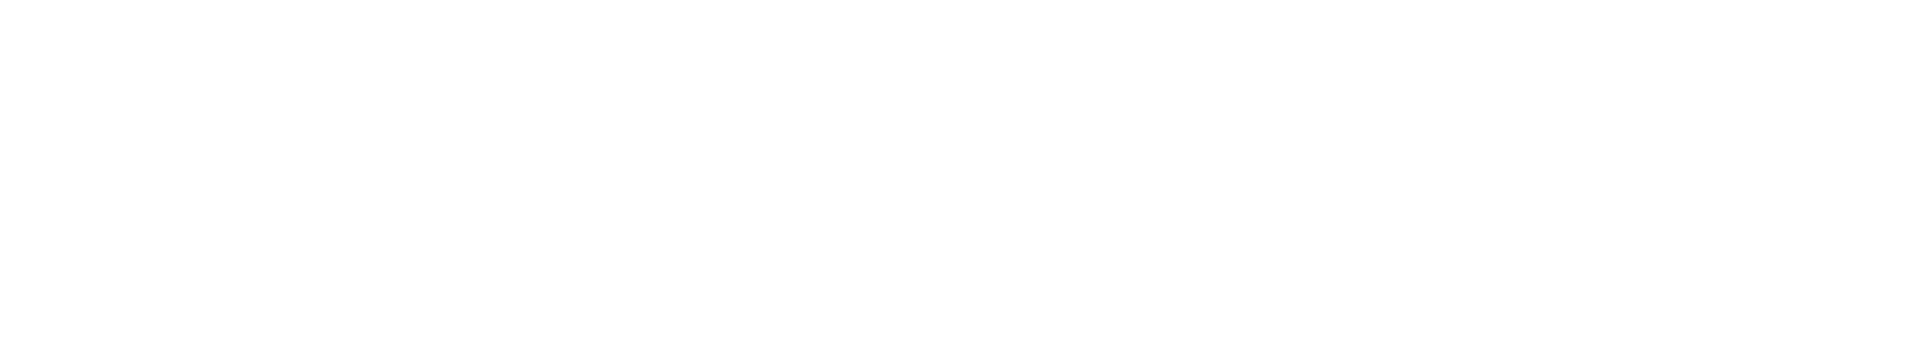 RetroZap